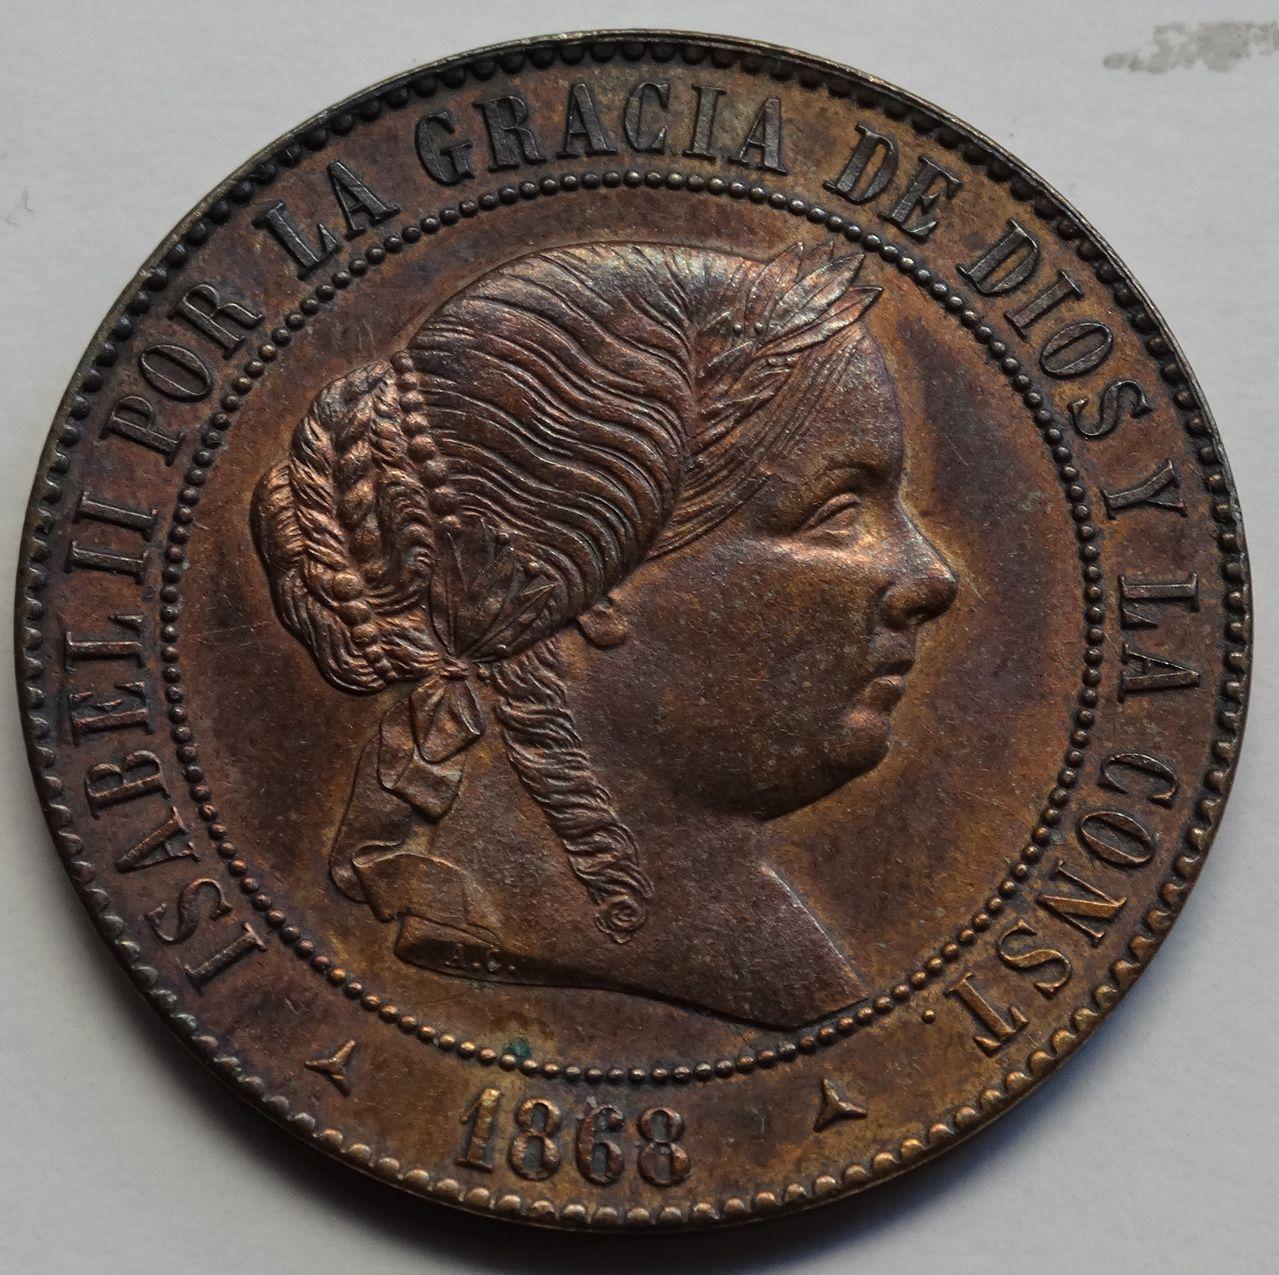 5 CENTIMOS DE ESCUDO 1868 SEGOVIA ISABEL II SC DSC02485